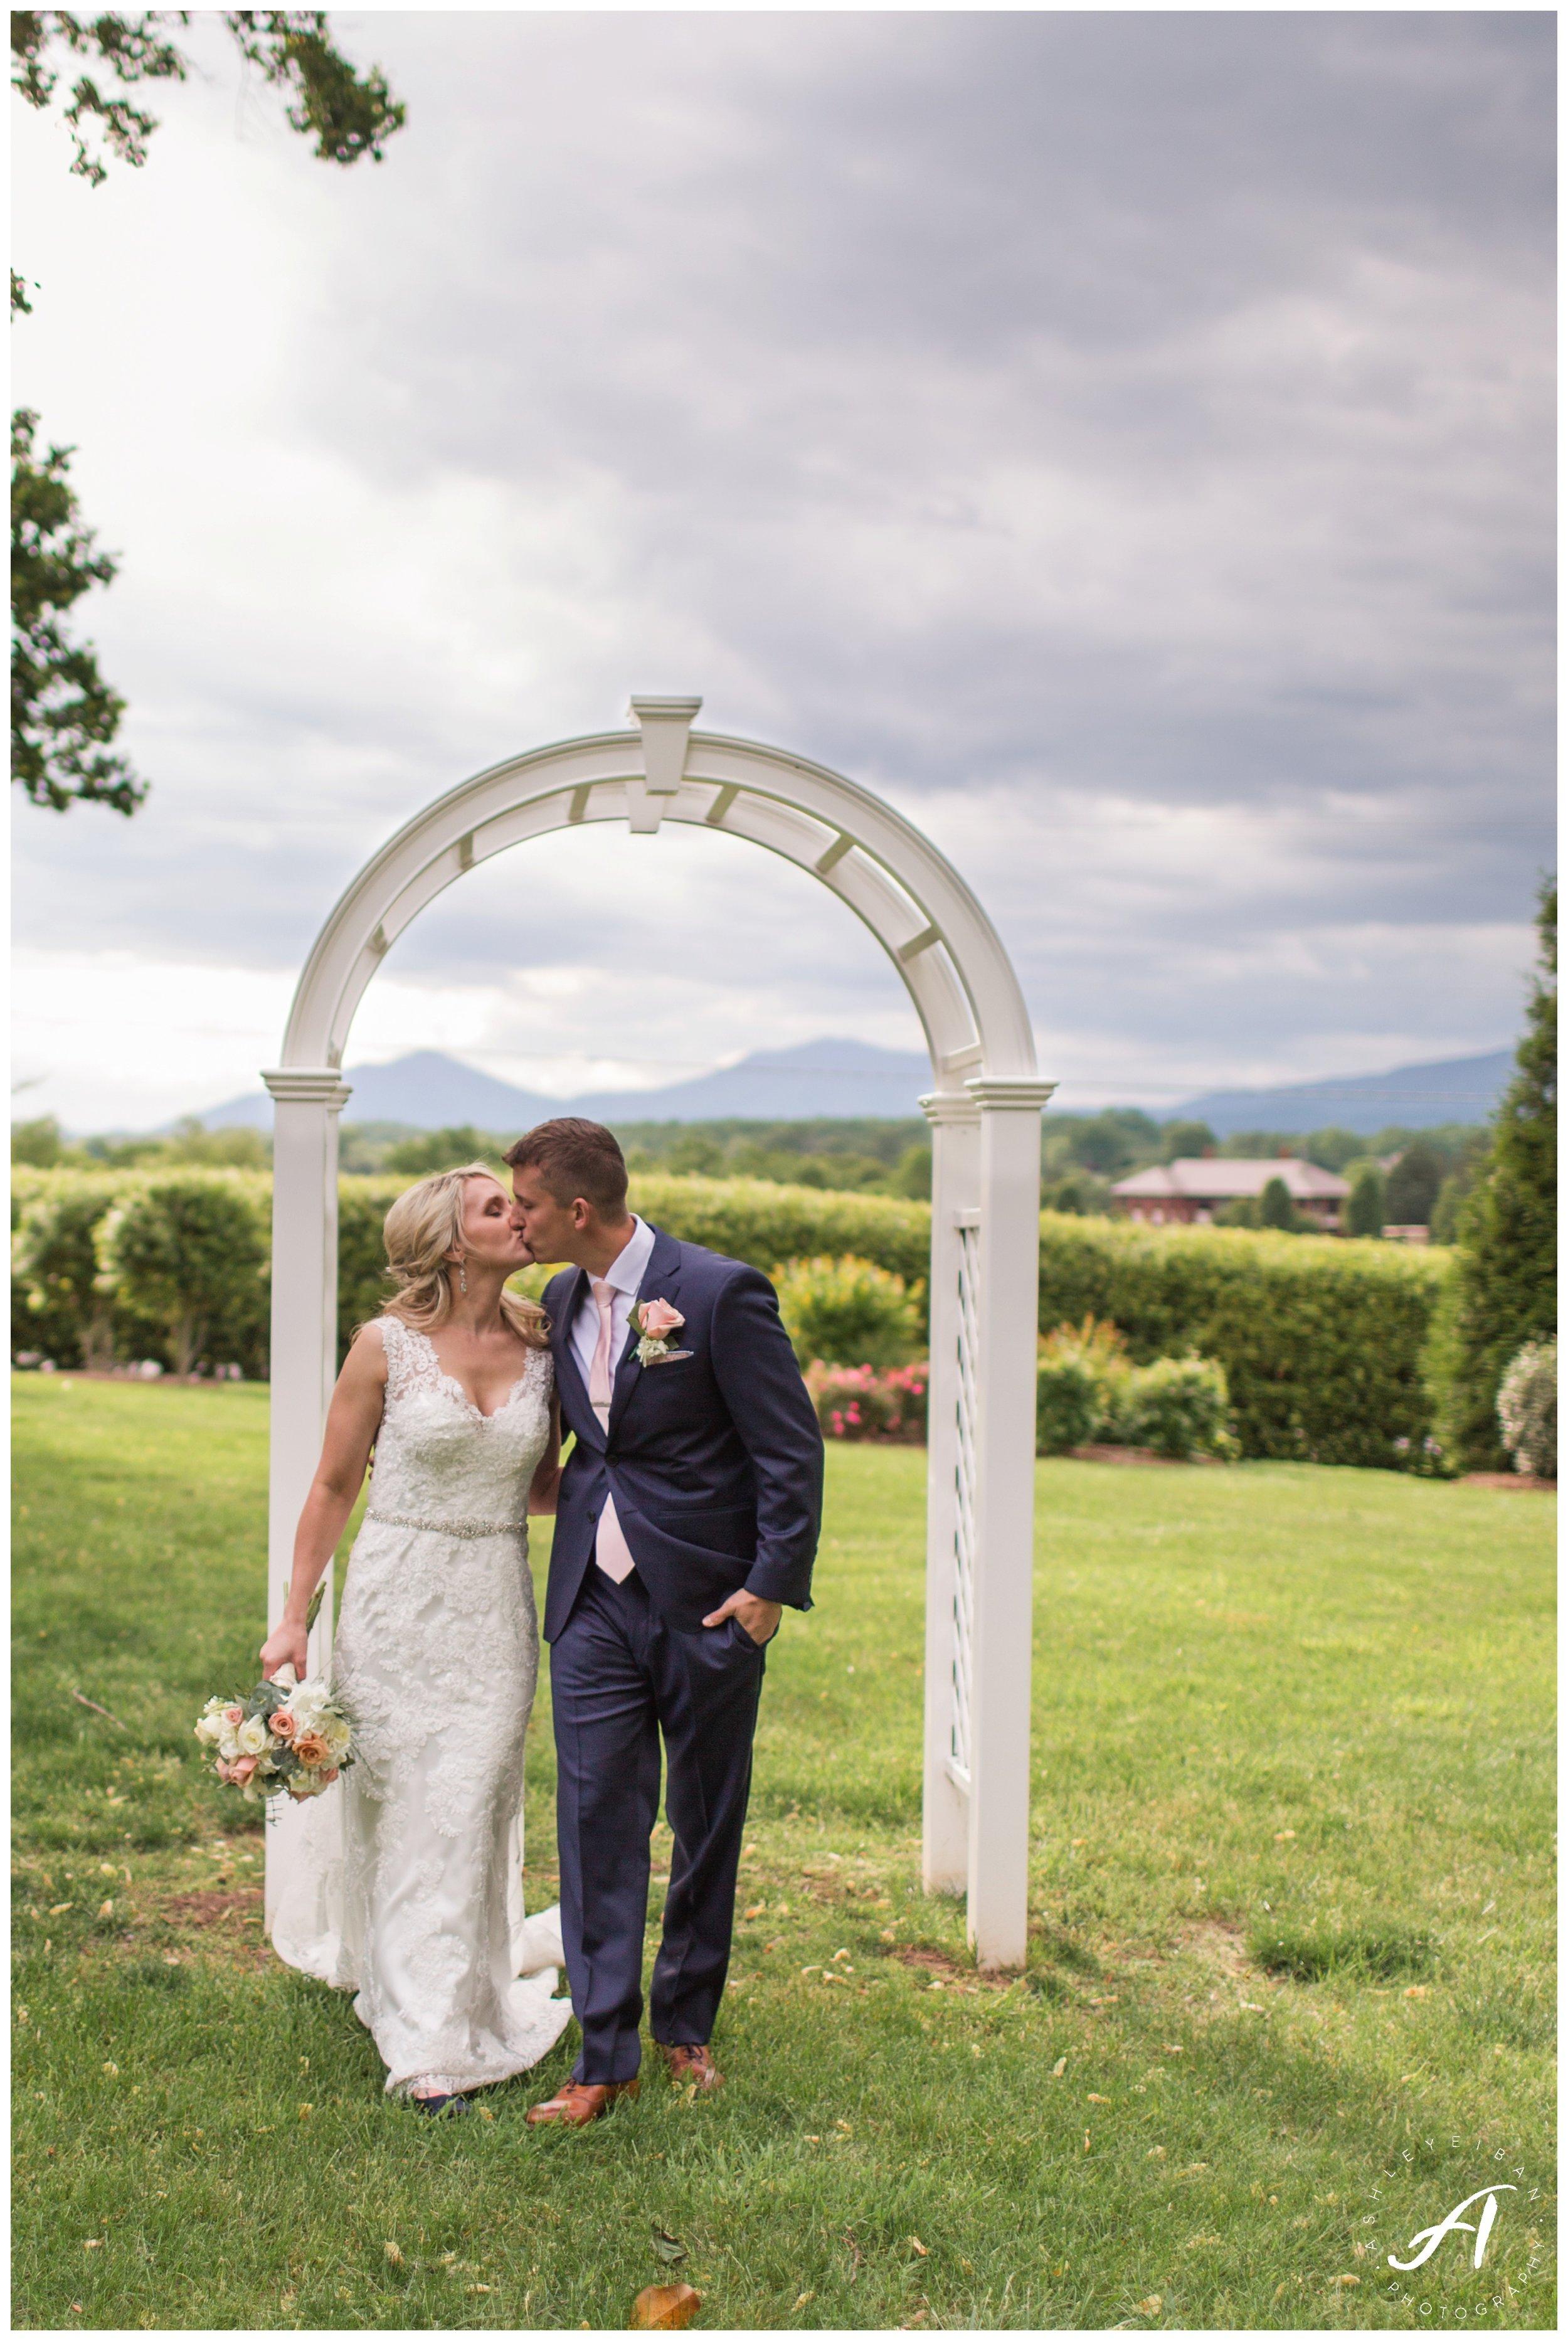 Sunset Portraits on a wedding day || Spring Trivium Estate Wedding || blush and navy wedding || Ashley Eiban Photography || www.ashleyeiban.com